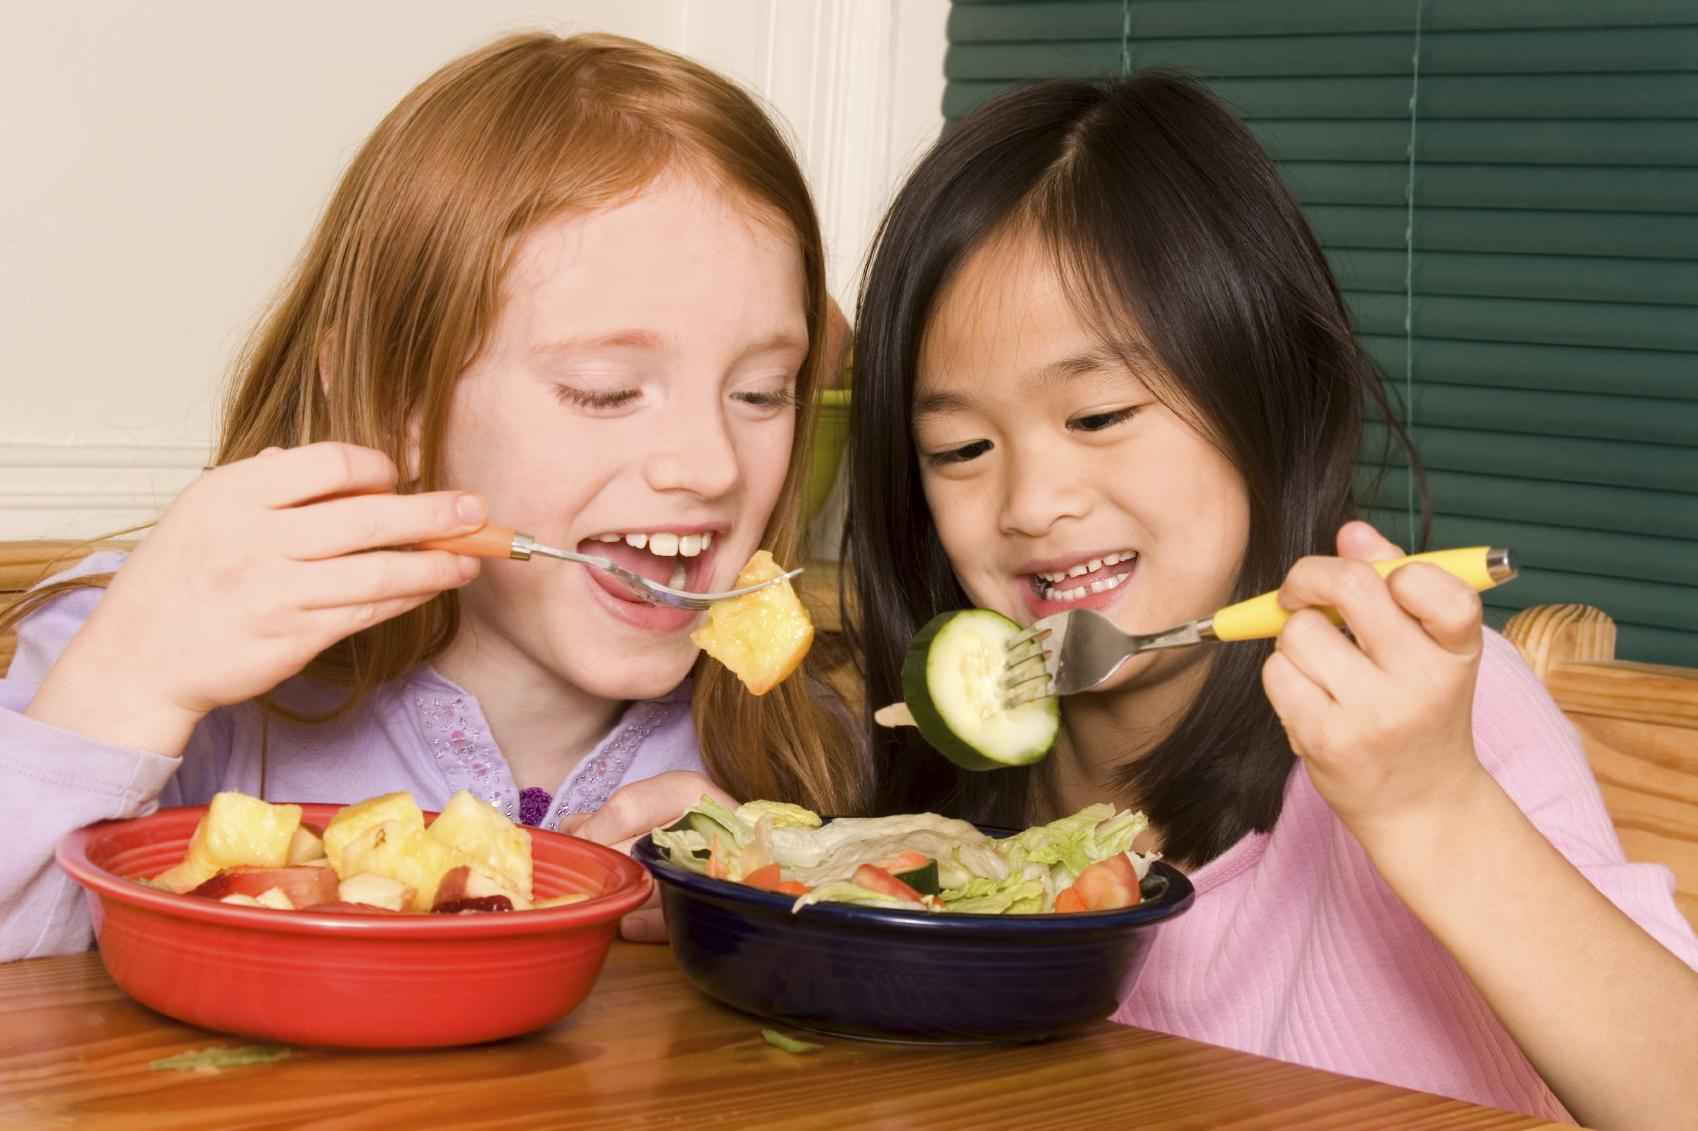 healthy eating habits for children essay